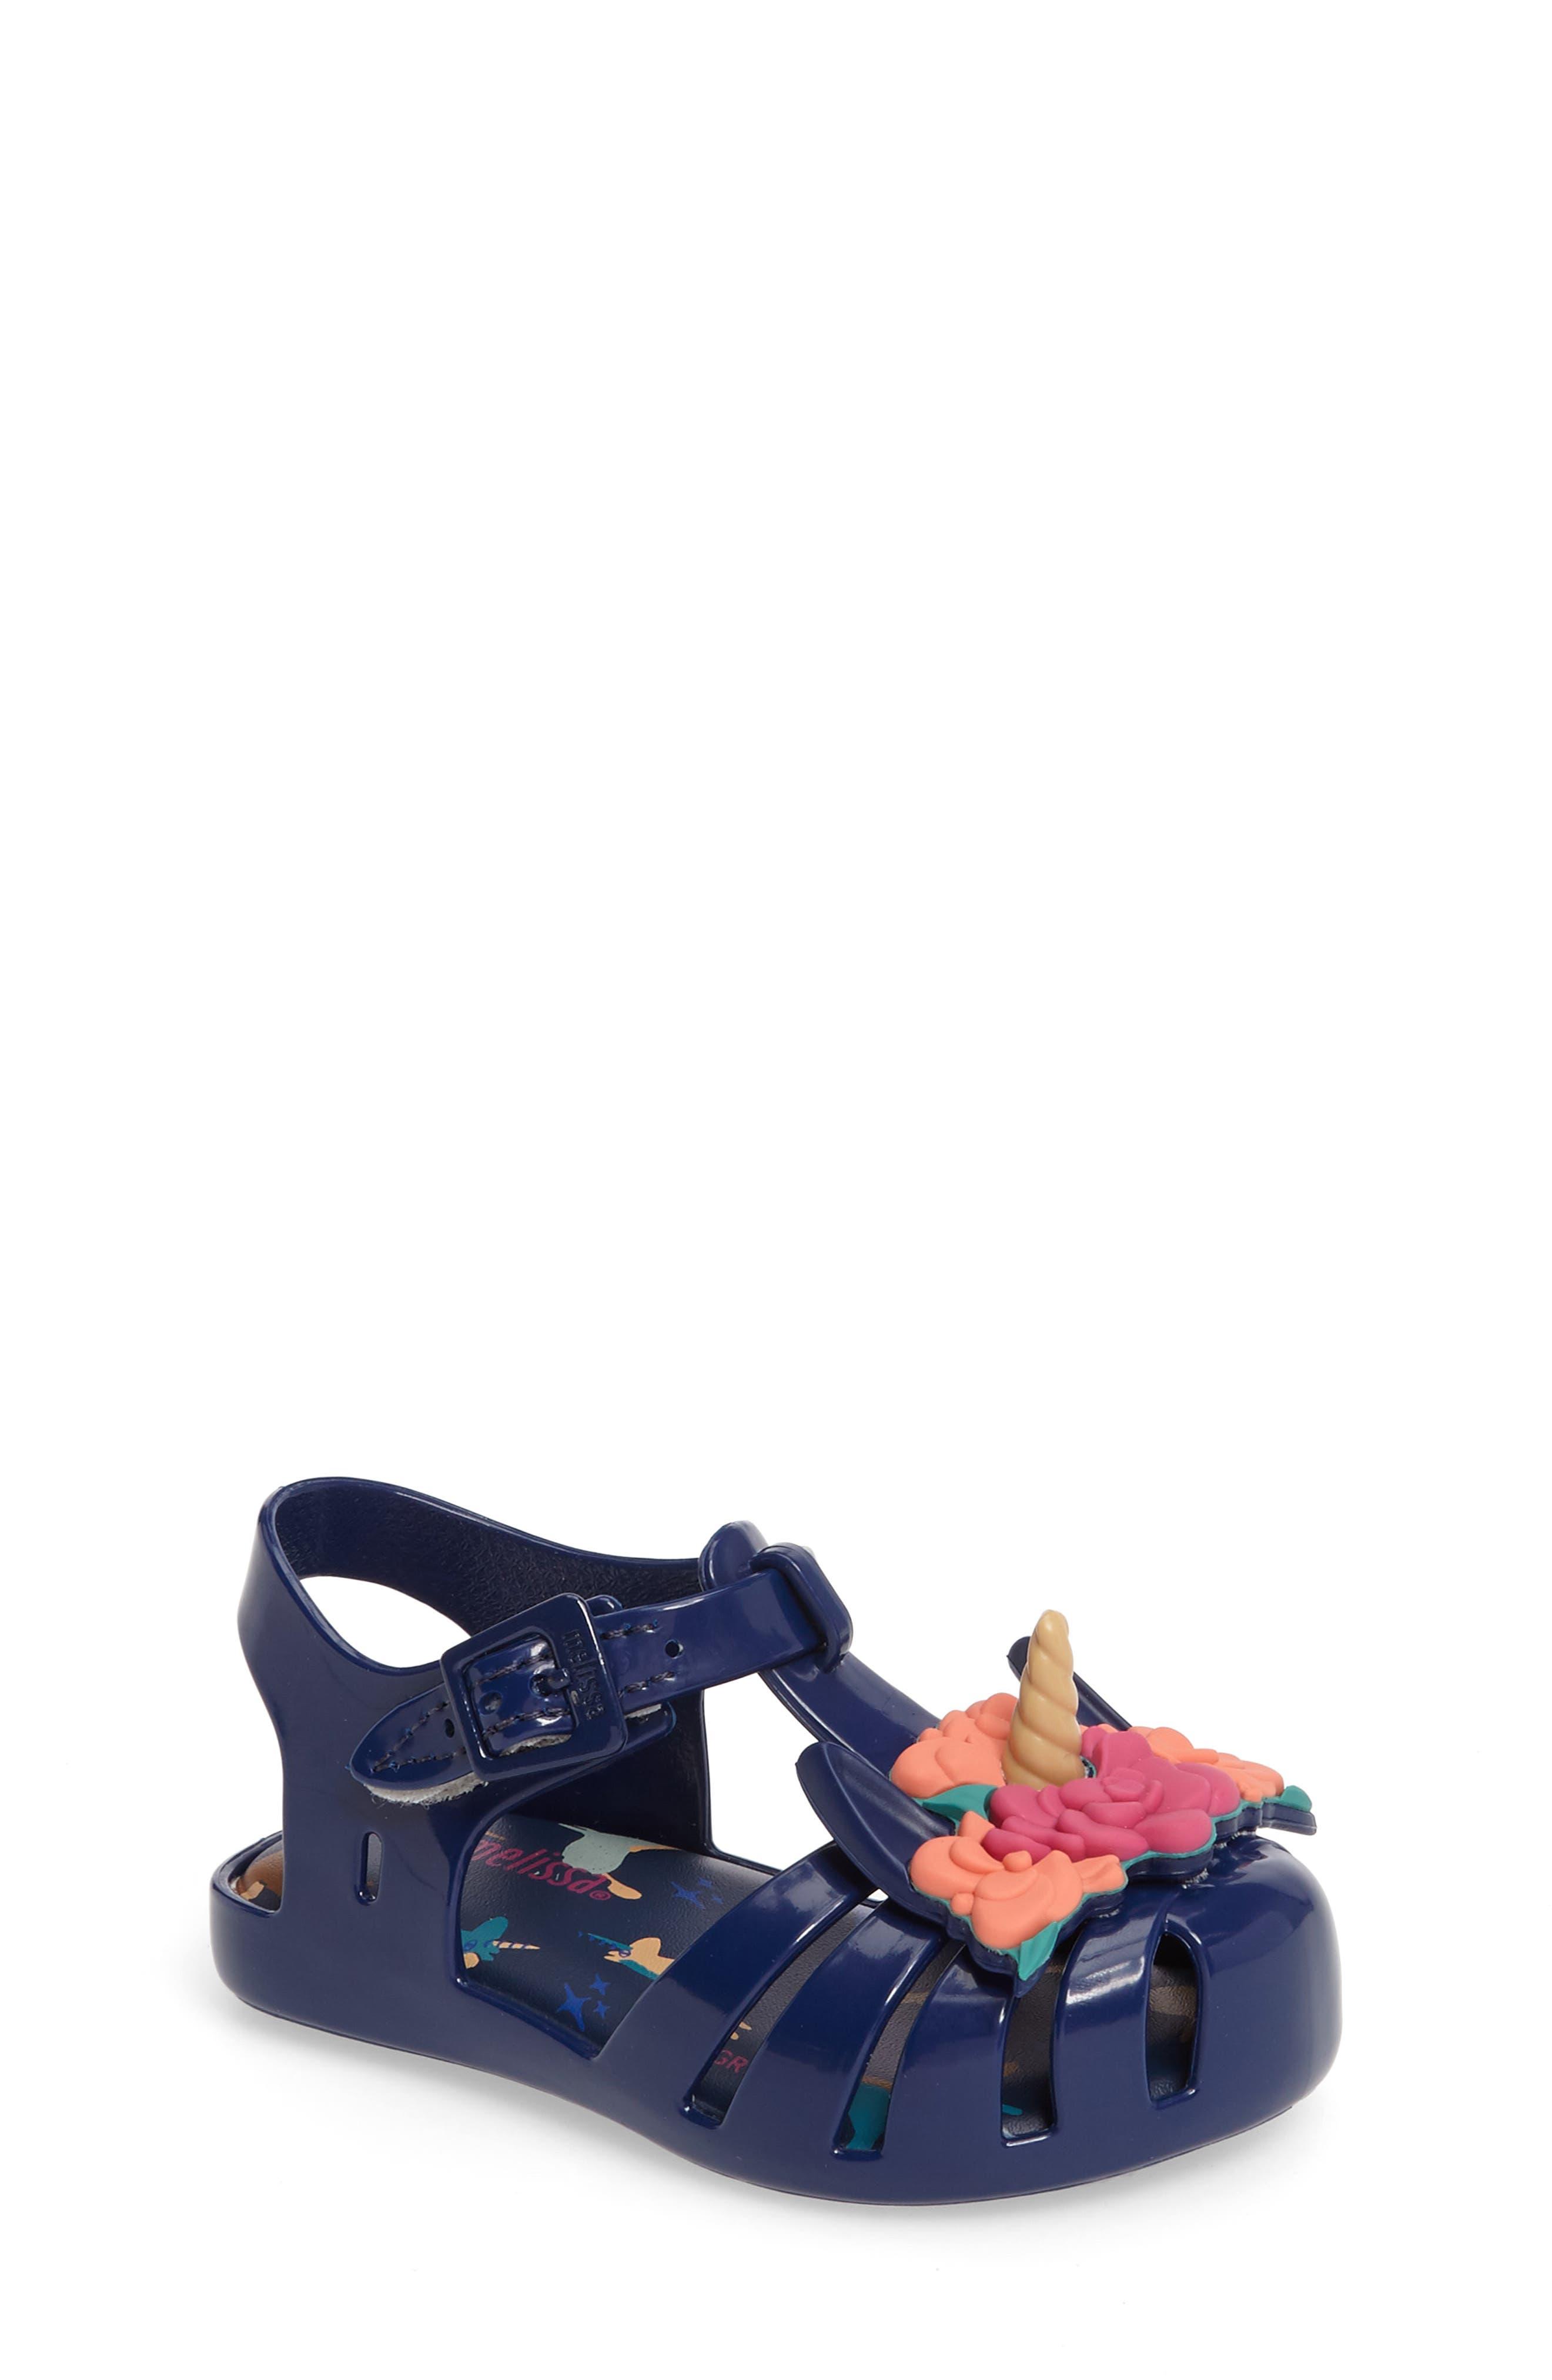 Main Image - Mini Melissa Aranha Fabula Unicorn Sandal (Walker & Toddler)